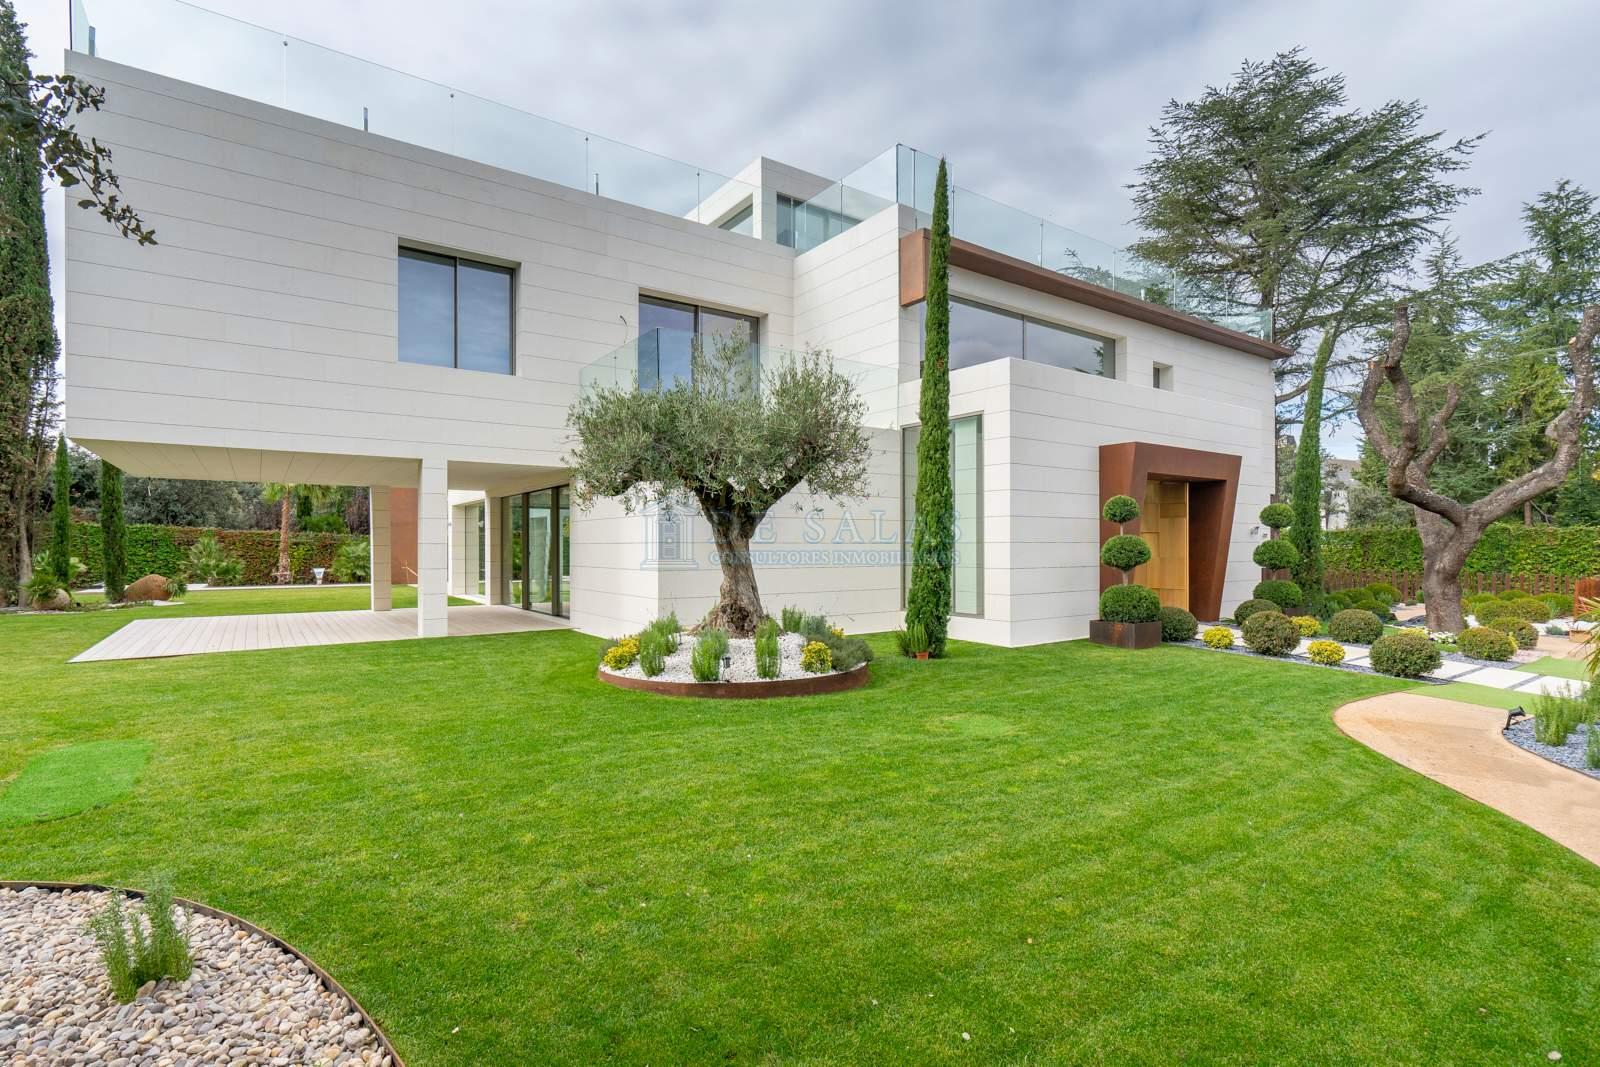 exteriores- Maison La Moraleja